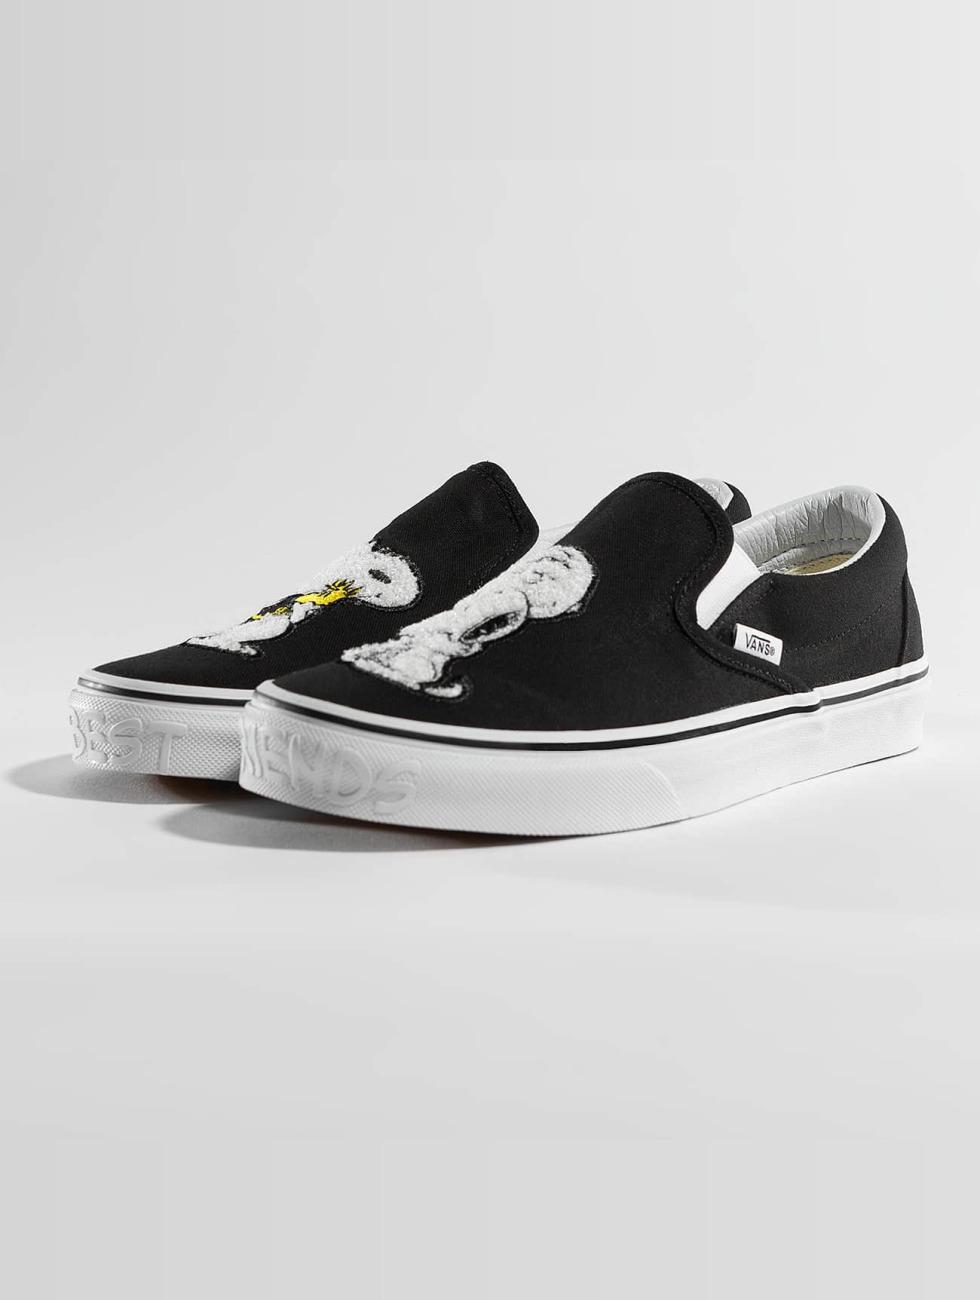 Vans Sneaker Peanuts Classic Slip On nero